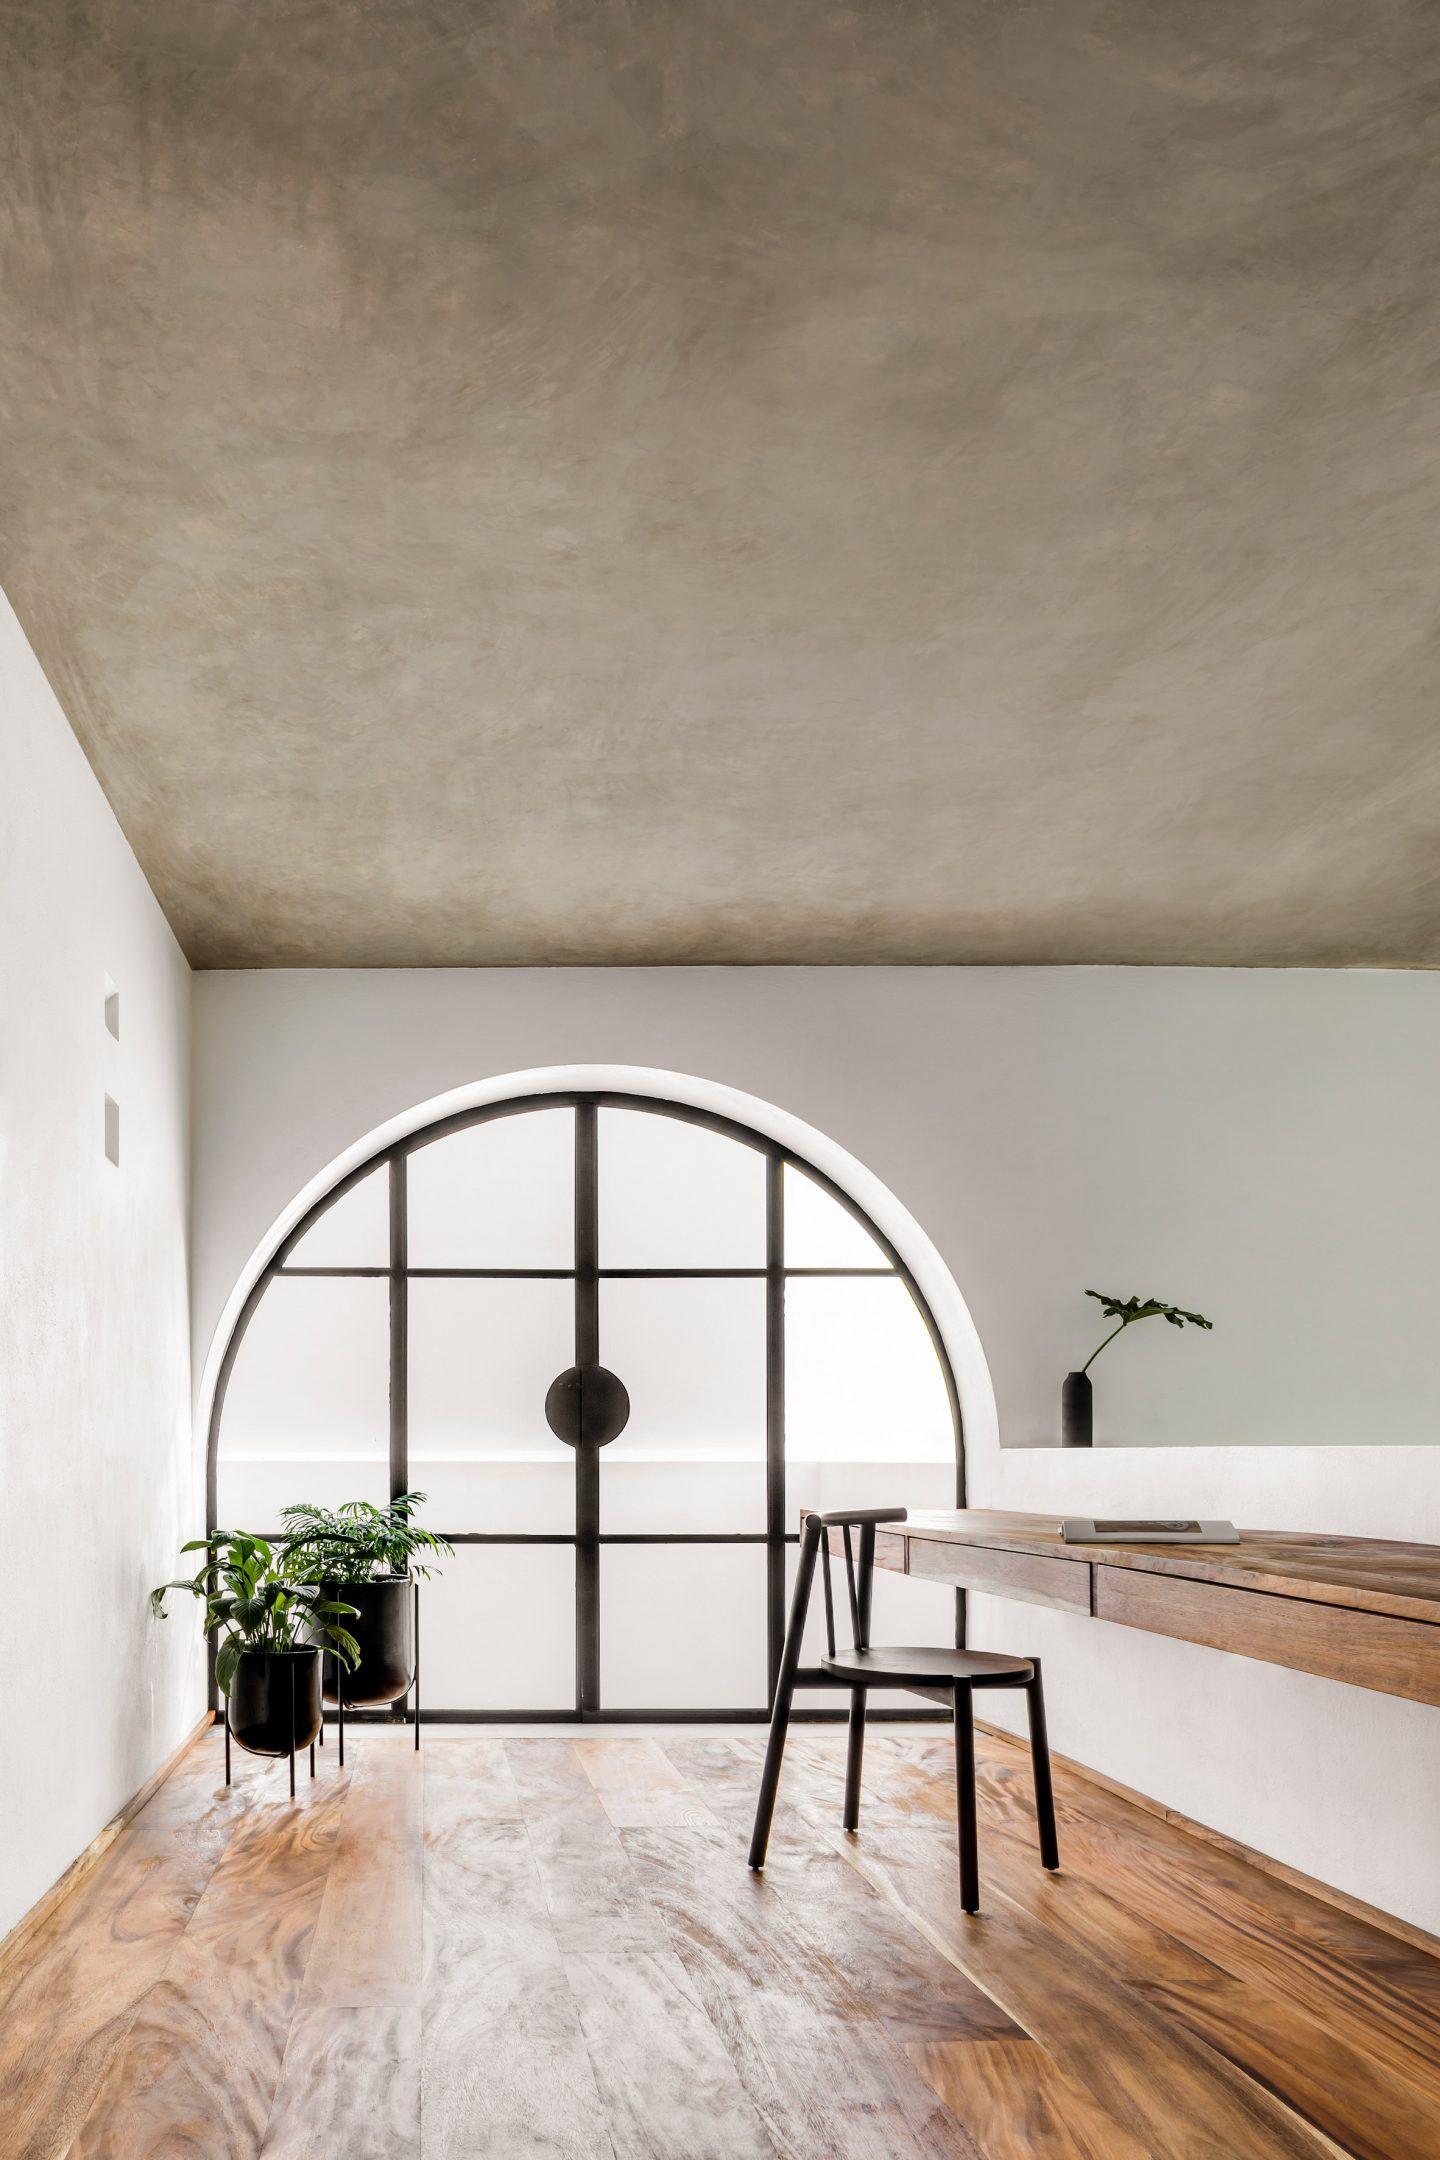 IGNANT-Architecture-Delfino-Lozano-Cesar-Bejar-Casa-690-02